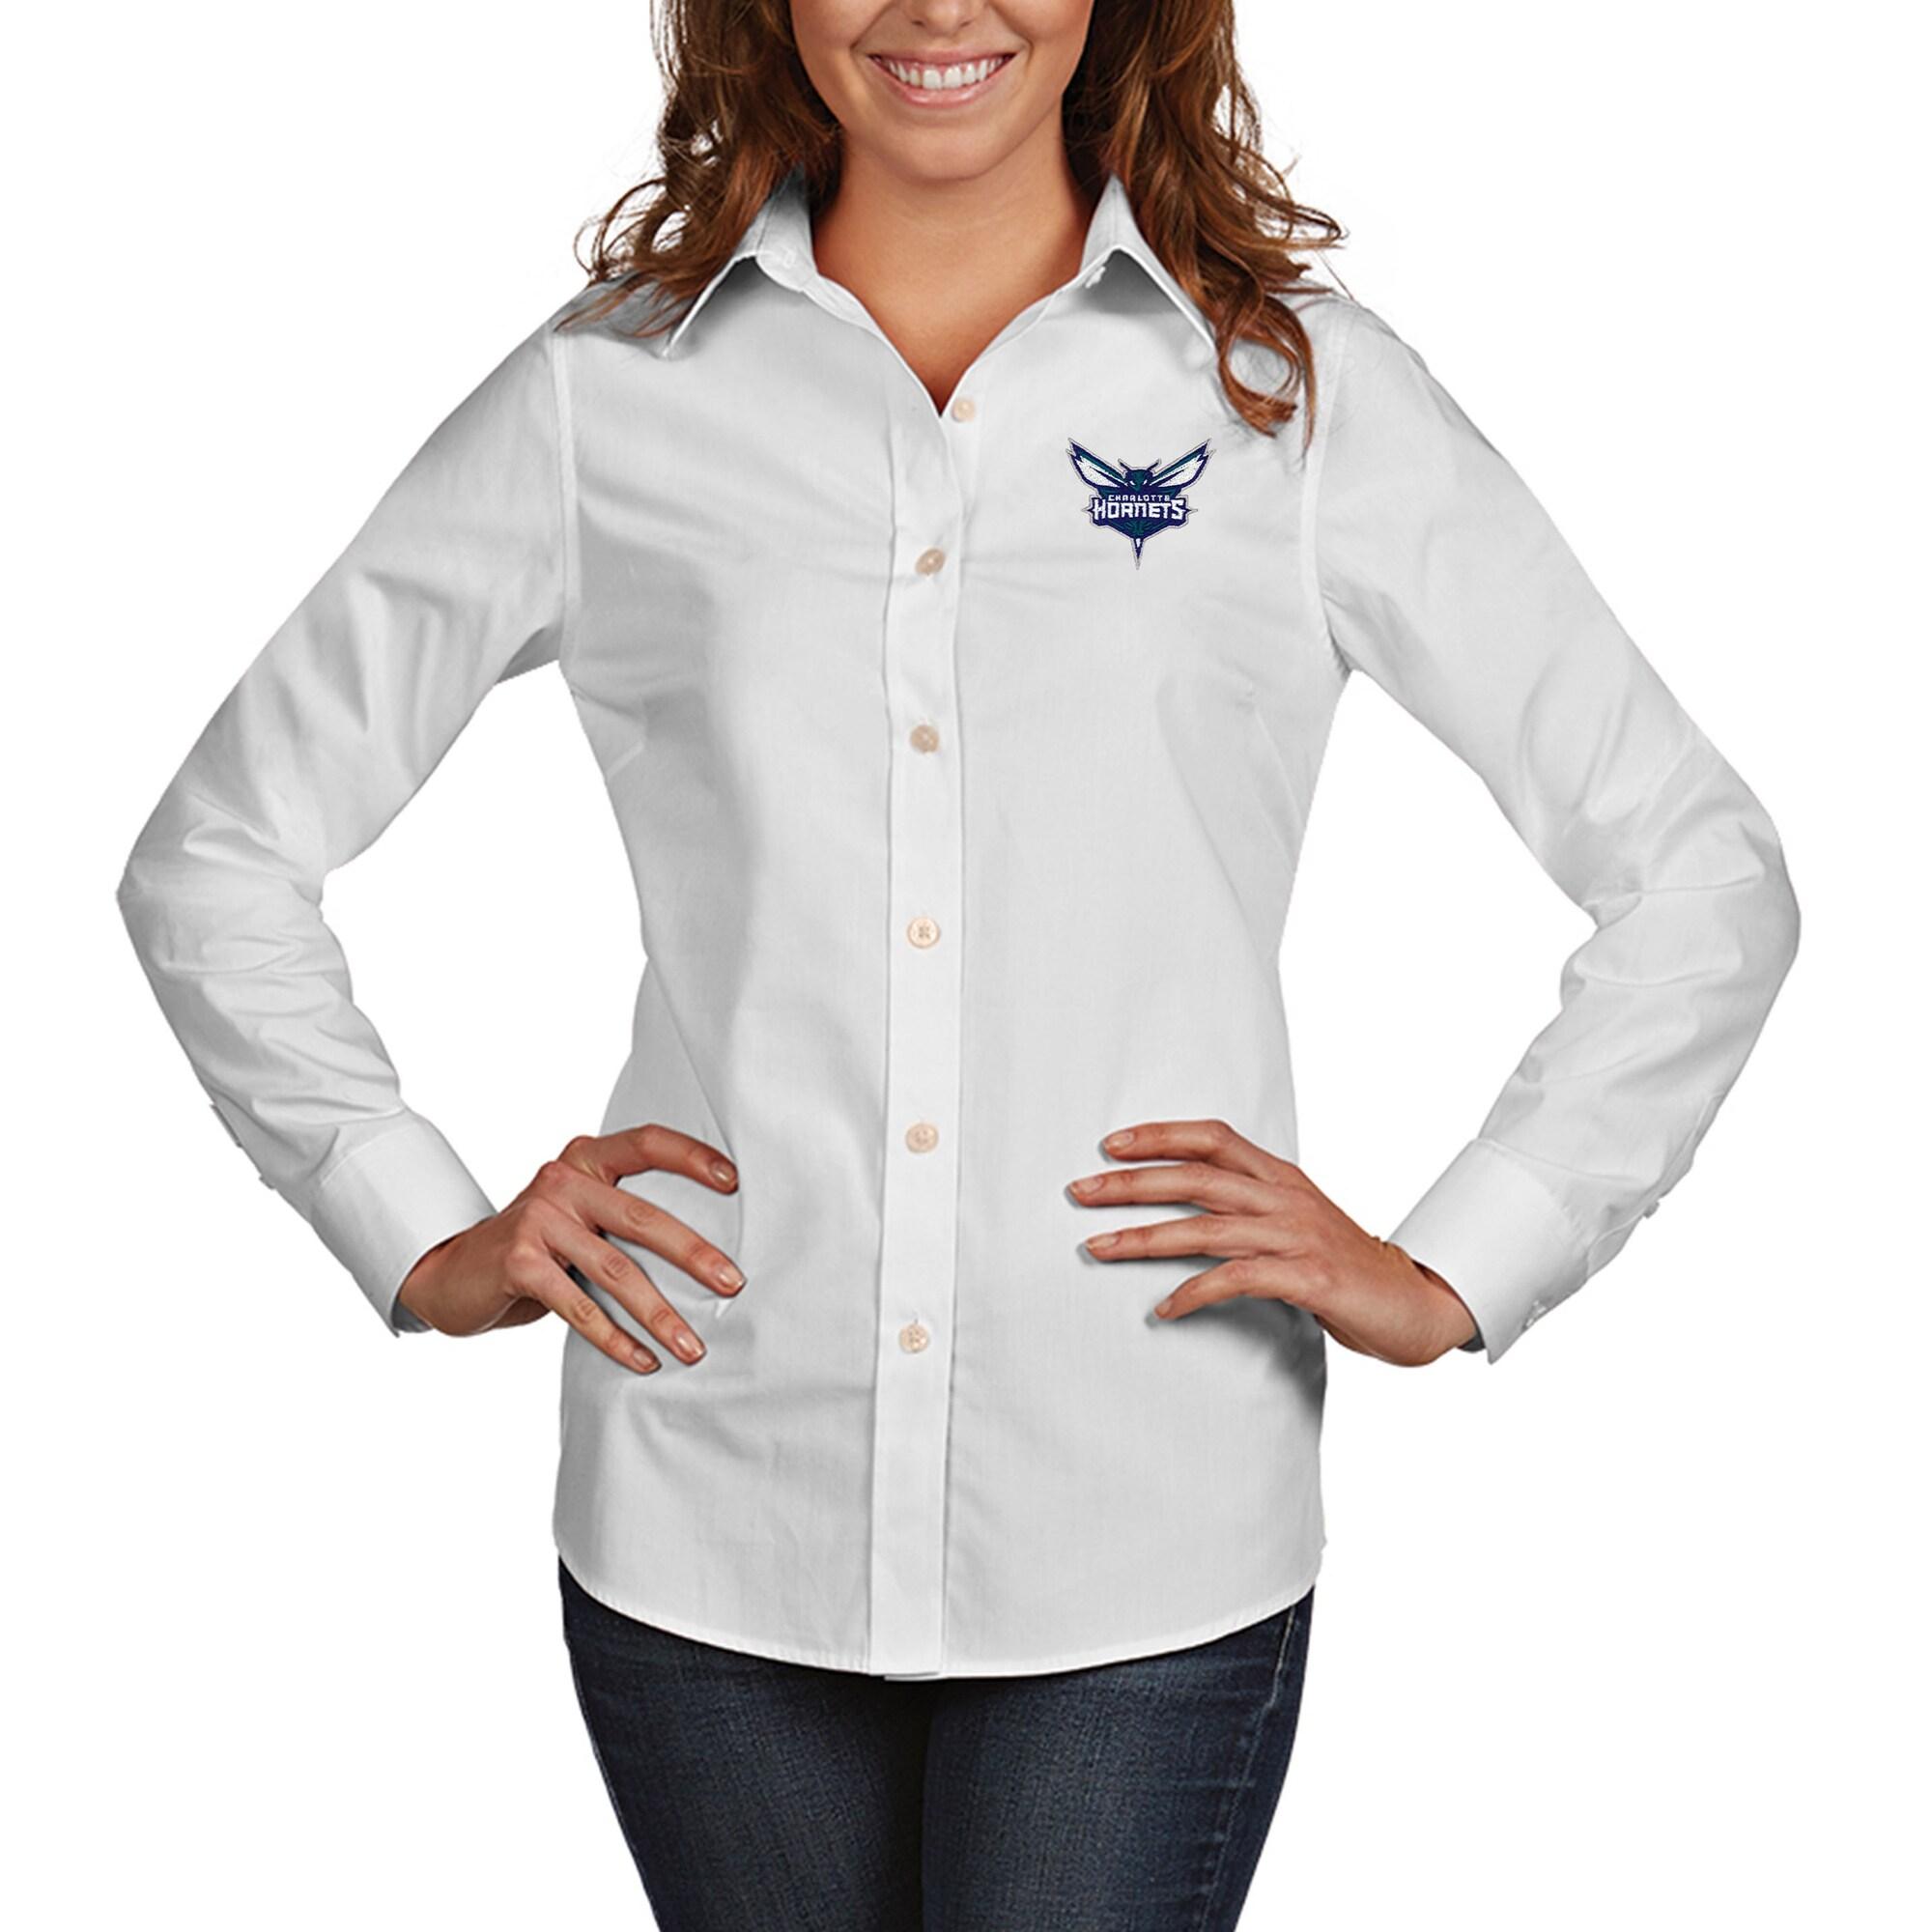 Charlotte Hornets Antigua Women's Dynasty Woven Button-Up Long Sleeve Shirt - White